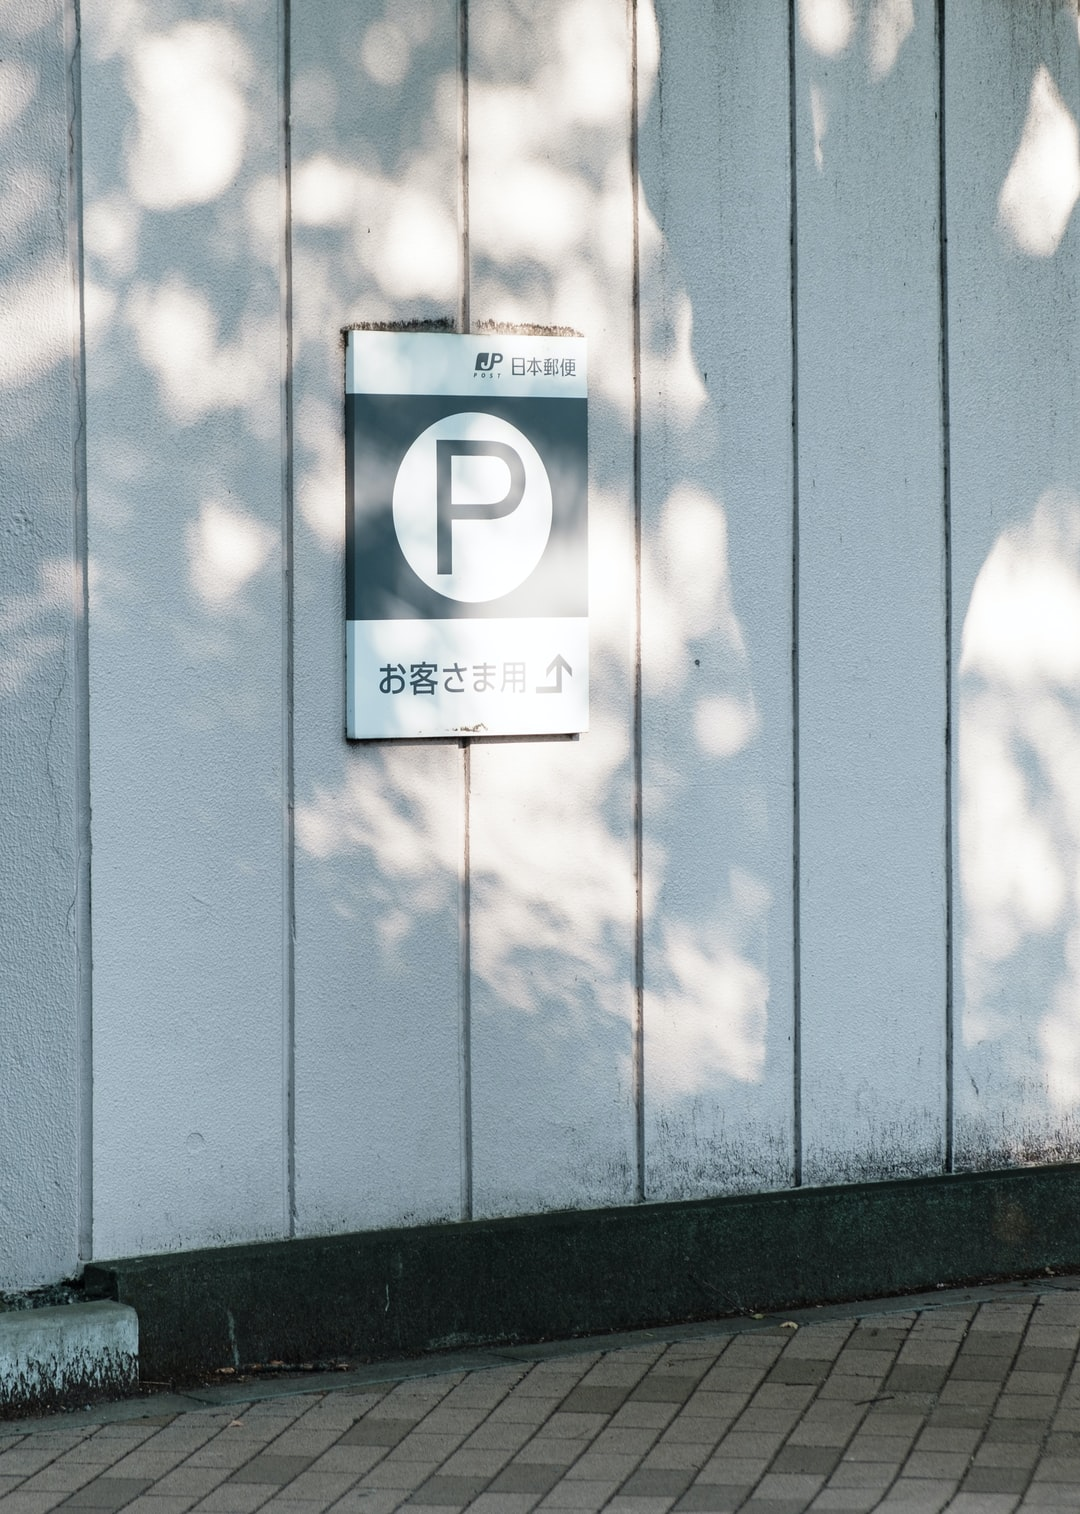 Parking indication mark